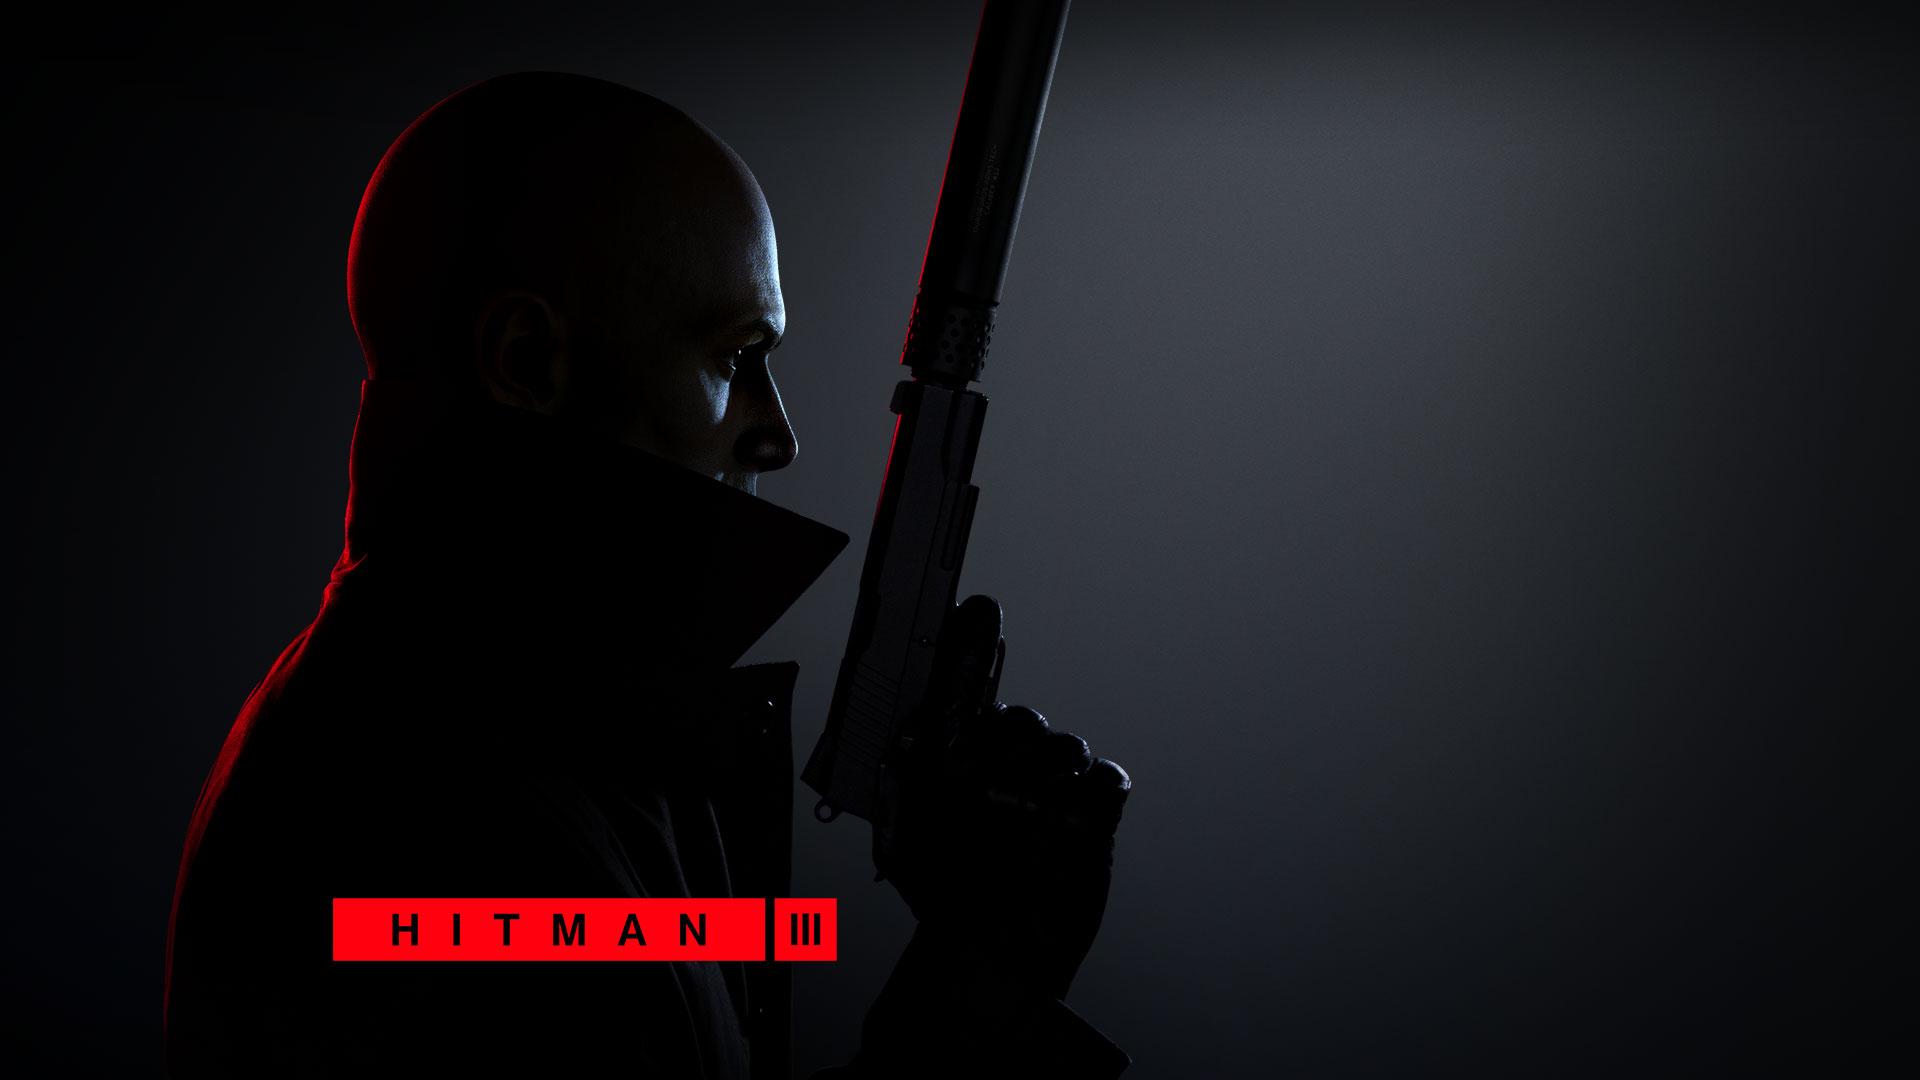 Hitman 3, profil de l'agent 47 tenant un pistolet silencieux